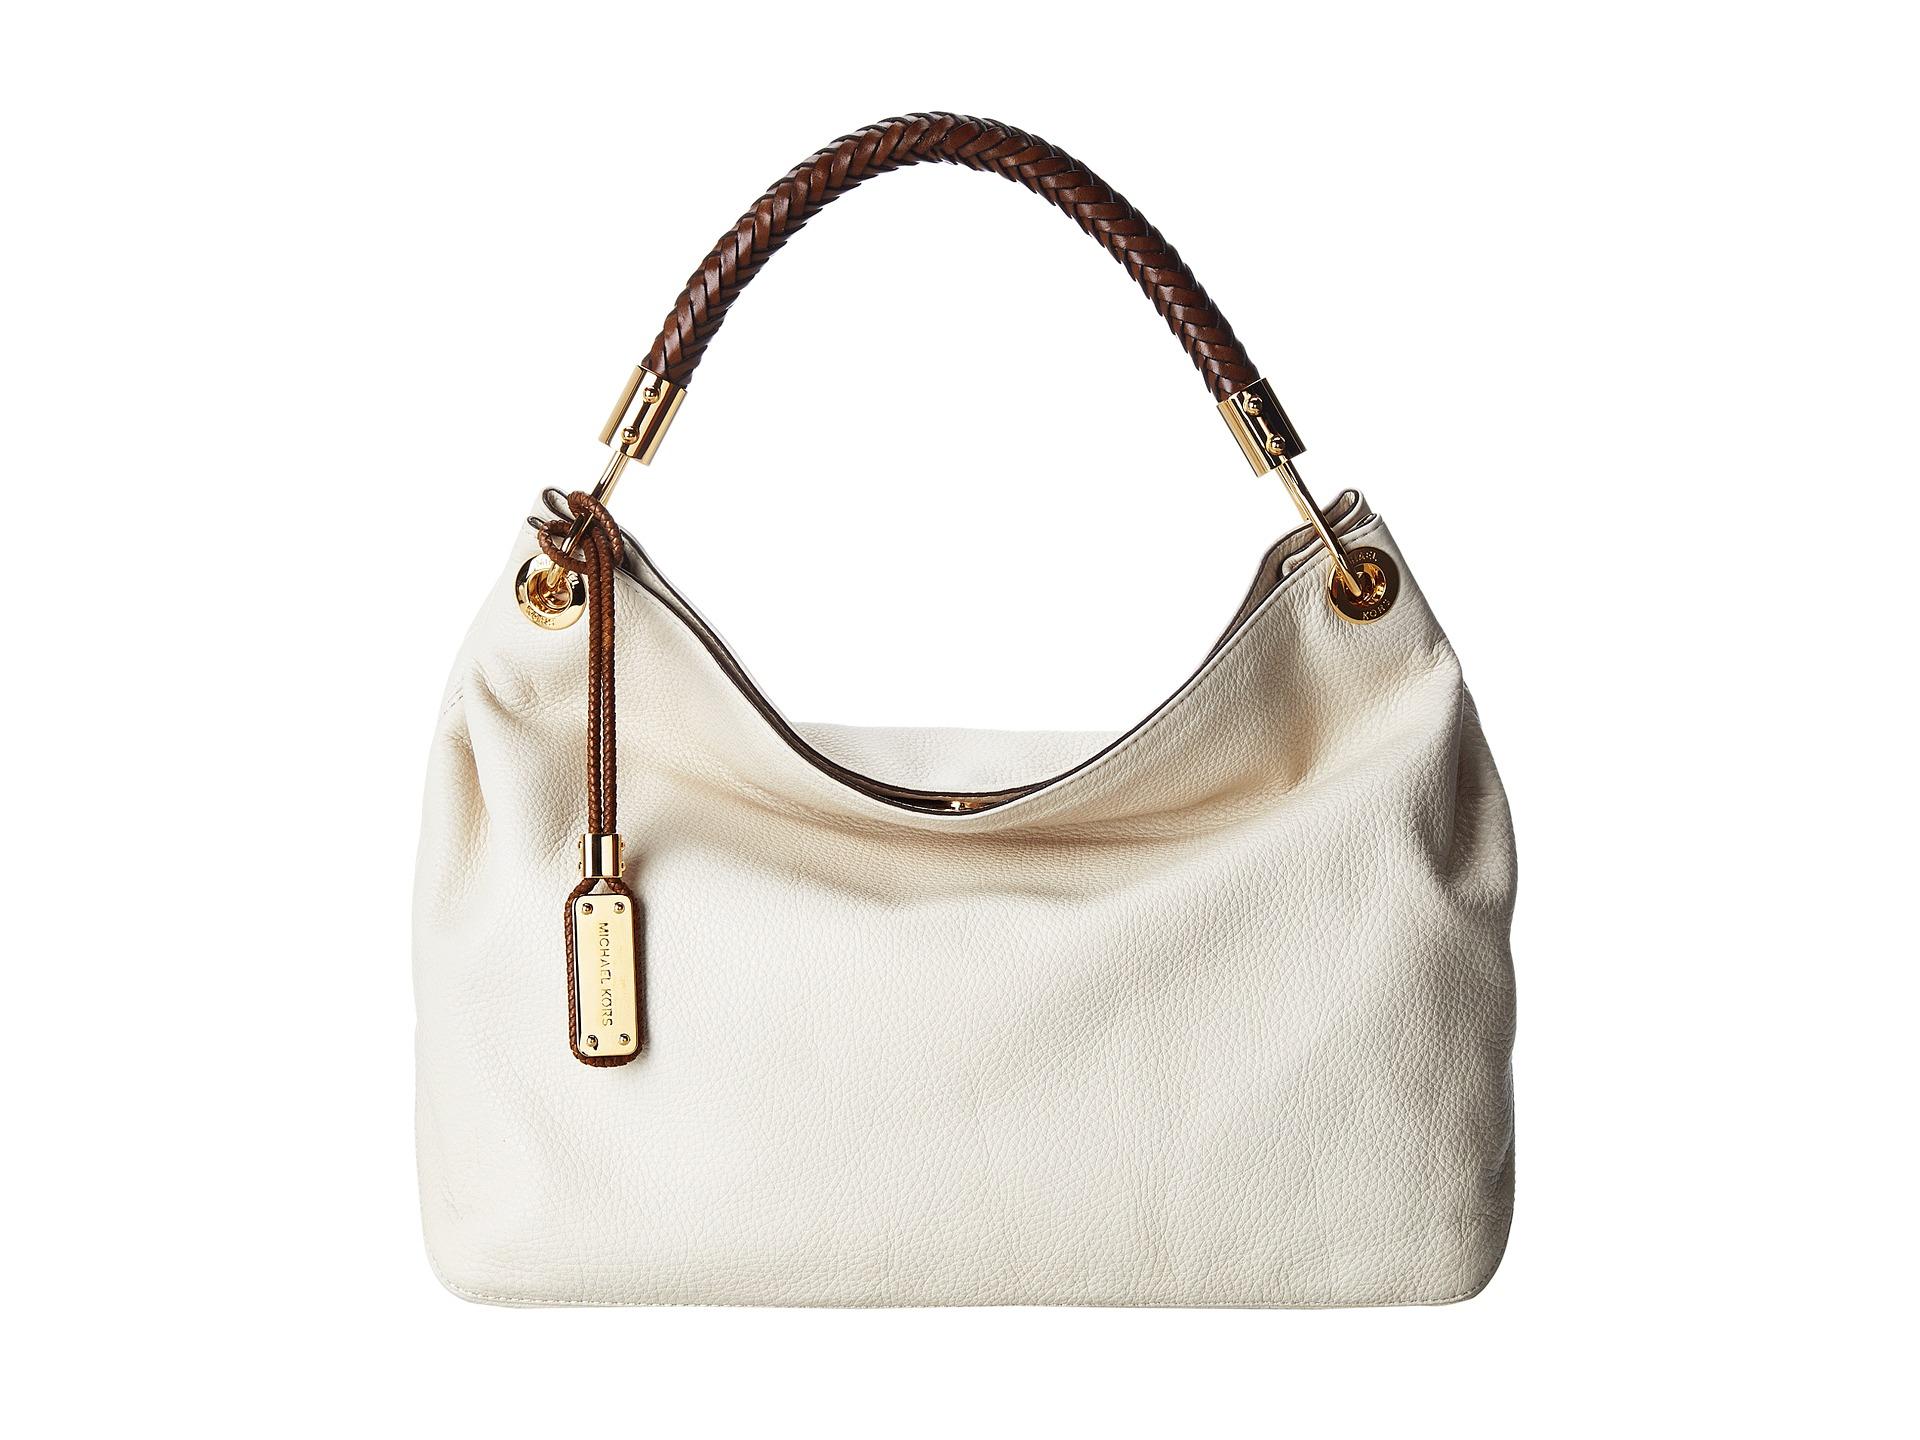 0c46d8230b7f39 ... sale lyst michael kors skorpios large shoulder bag in white 79bca 7a6ff  ...